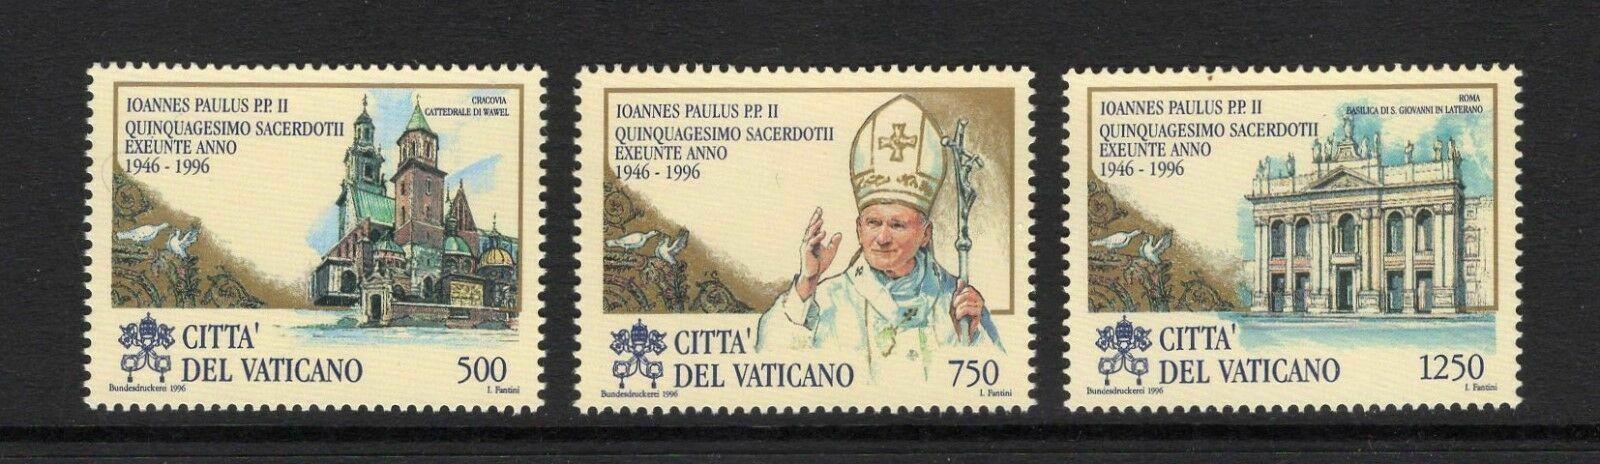 Vatican1012 14